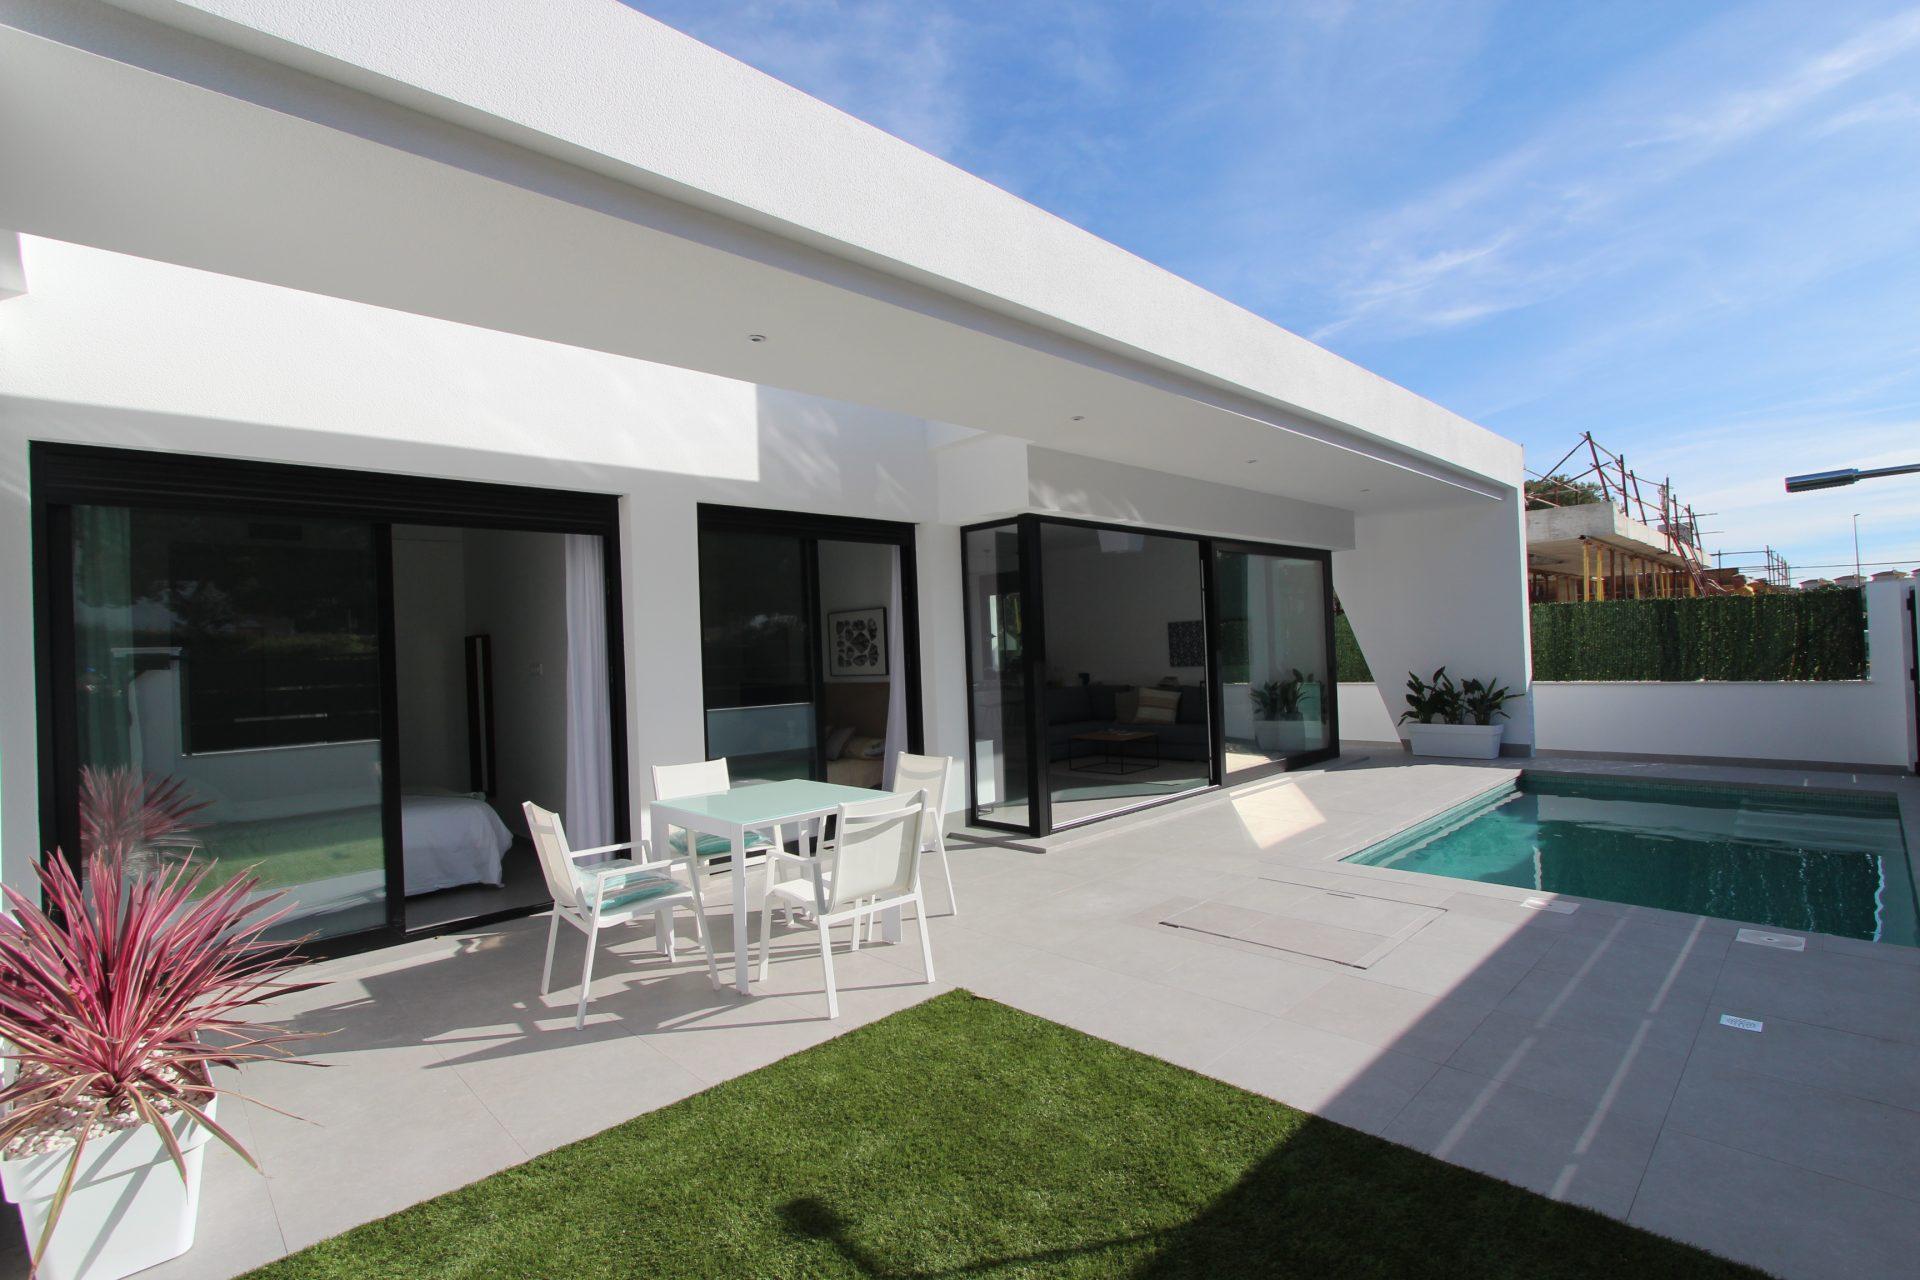 Stunning  1 Level 3 Bed Rio Verde Villas in Beautiful Location